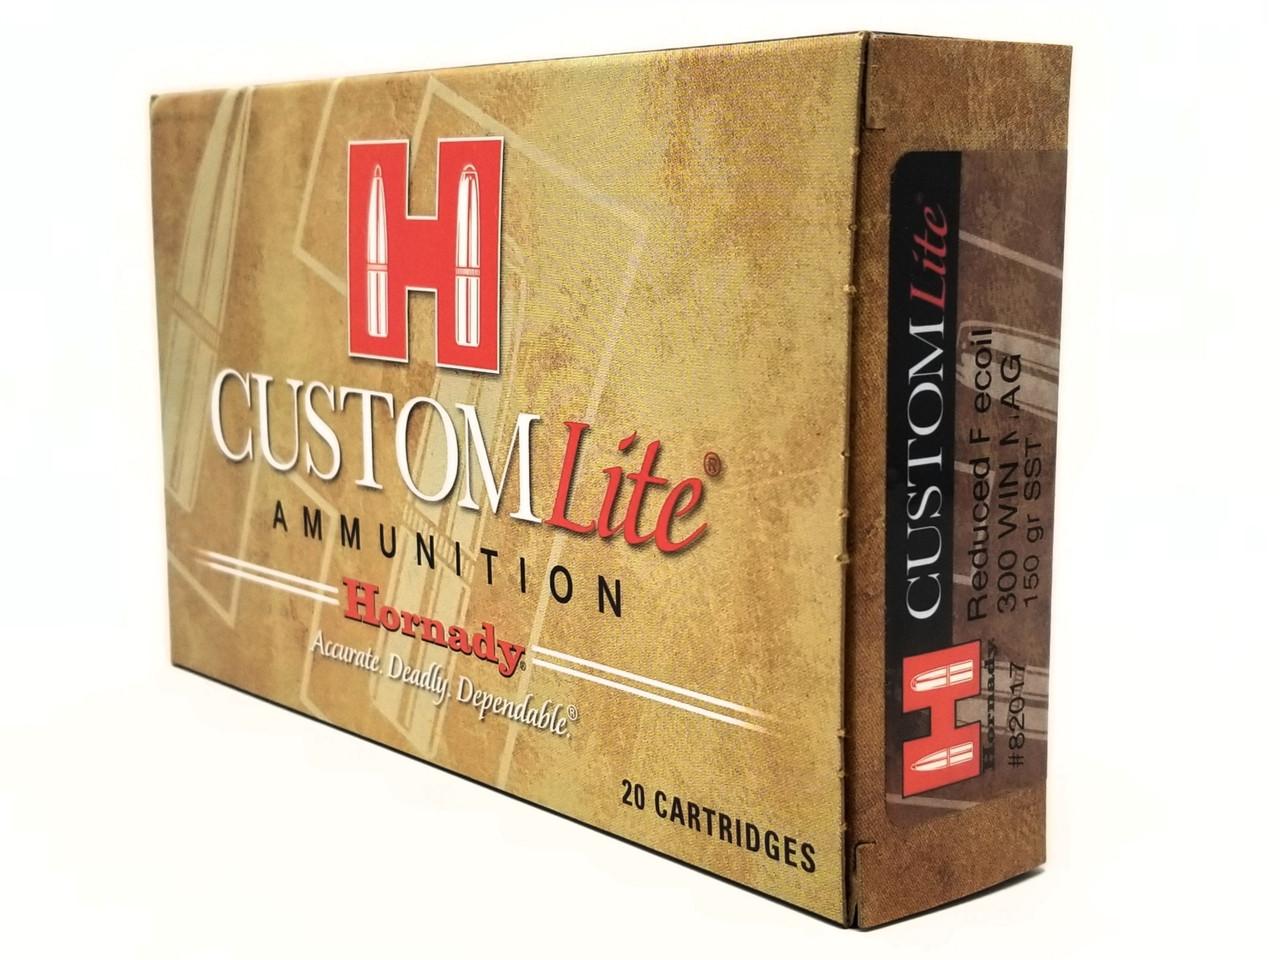 Hornady 300 Win Mag Ammunition Custom Light 82017 150 Grain SST 20 Rounds